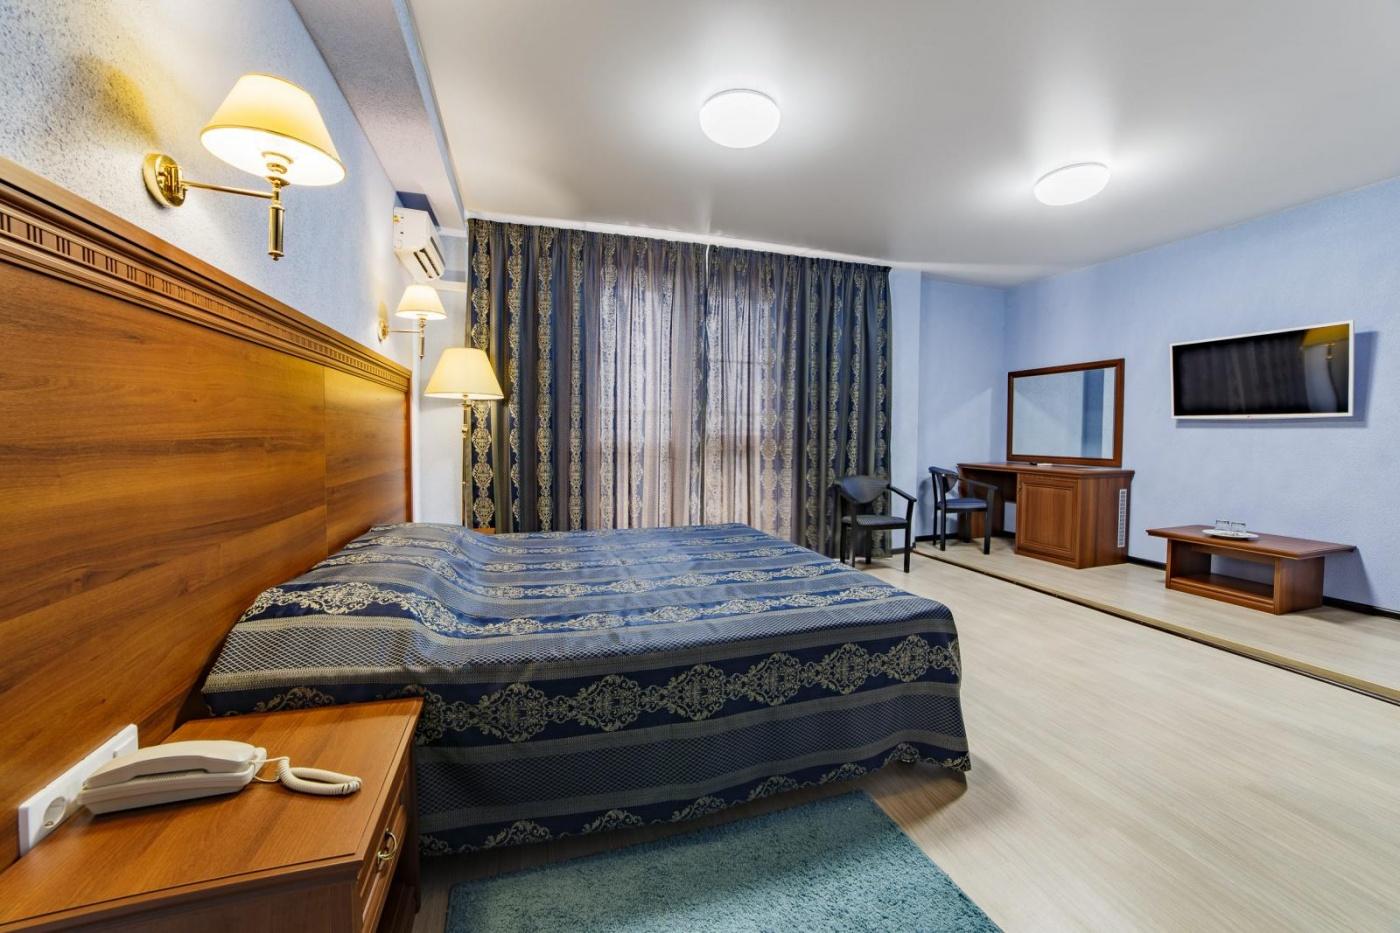 Отель «Relax» Краснодарский край Delux, фото 2